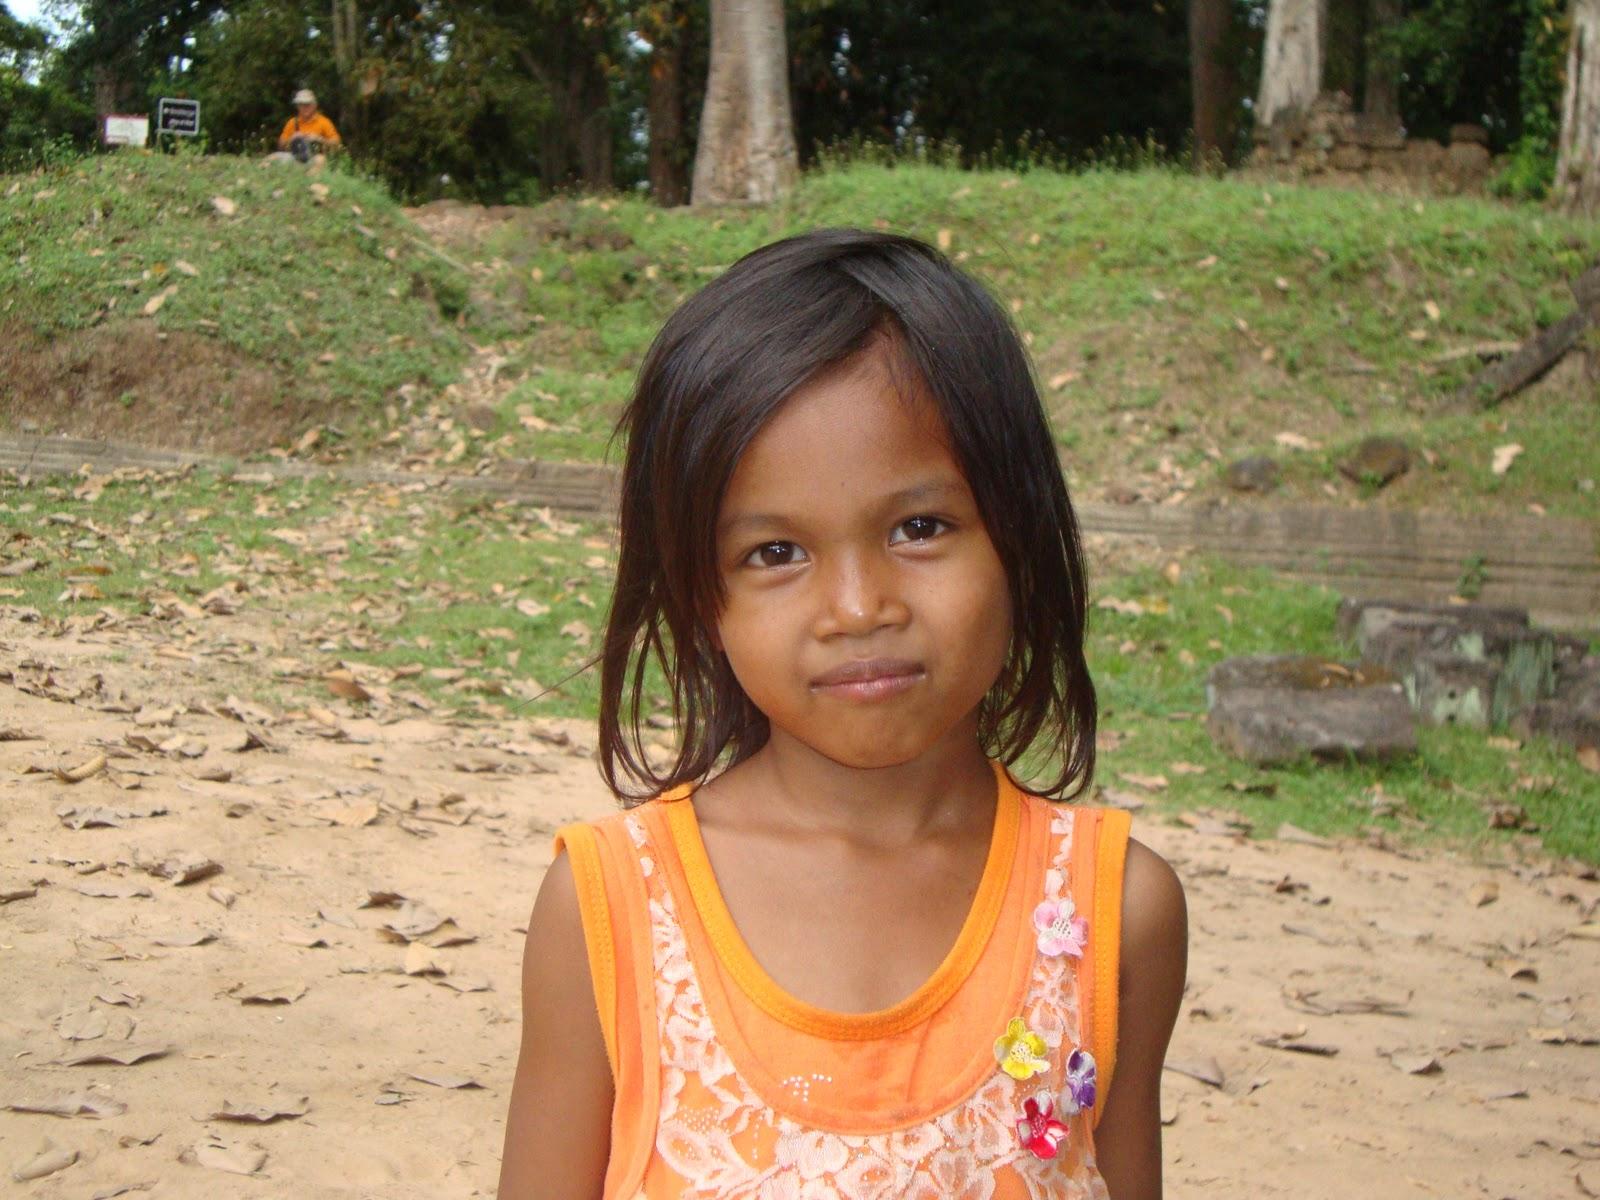 Cambodian Girl Nude Images | FemaleCelebrity - 303.9KB